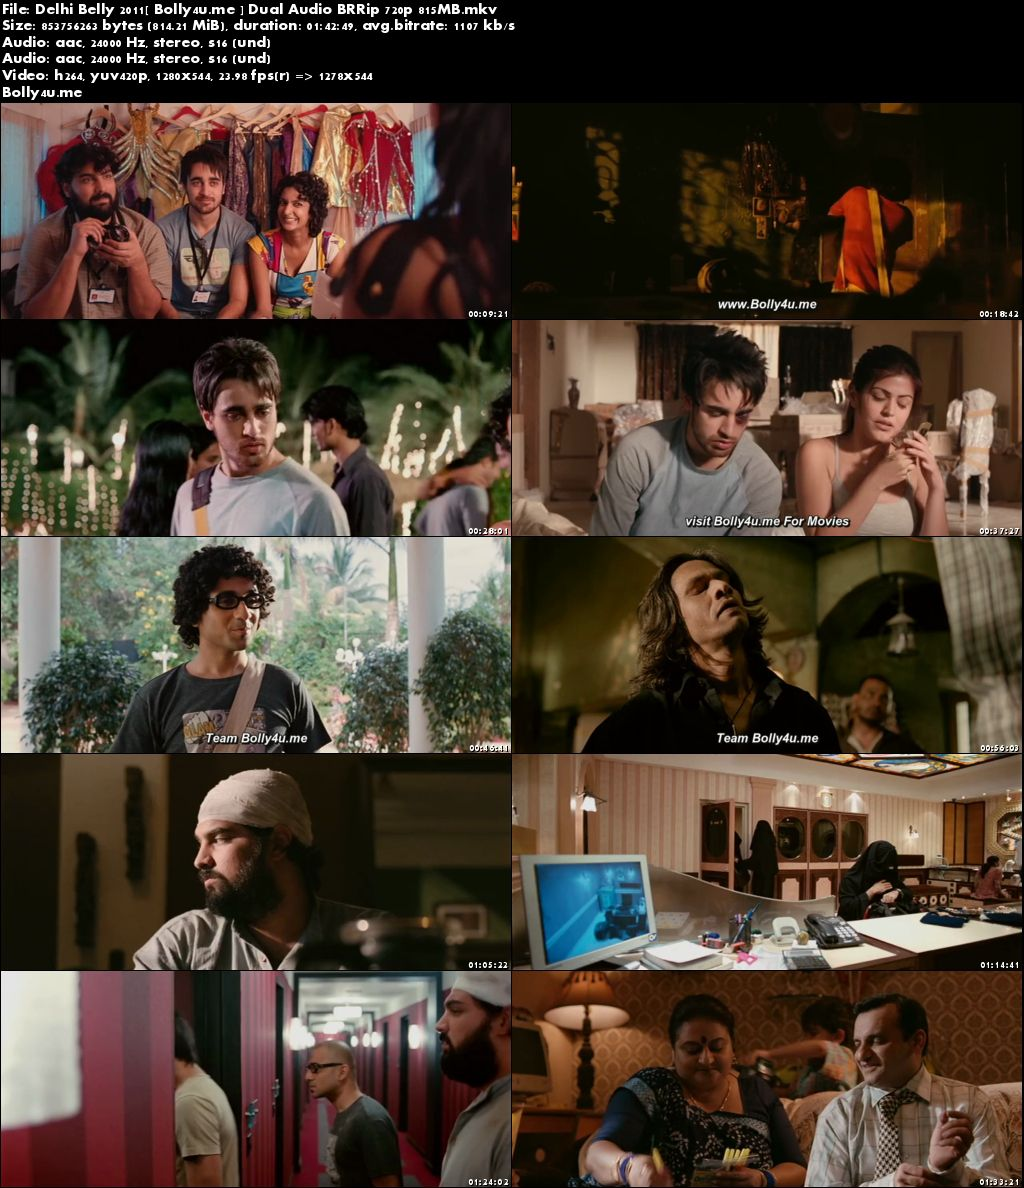 Delhi Belly 2011 BluRay 350Mb Hindi Dual Audio 480p Download